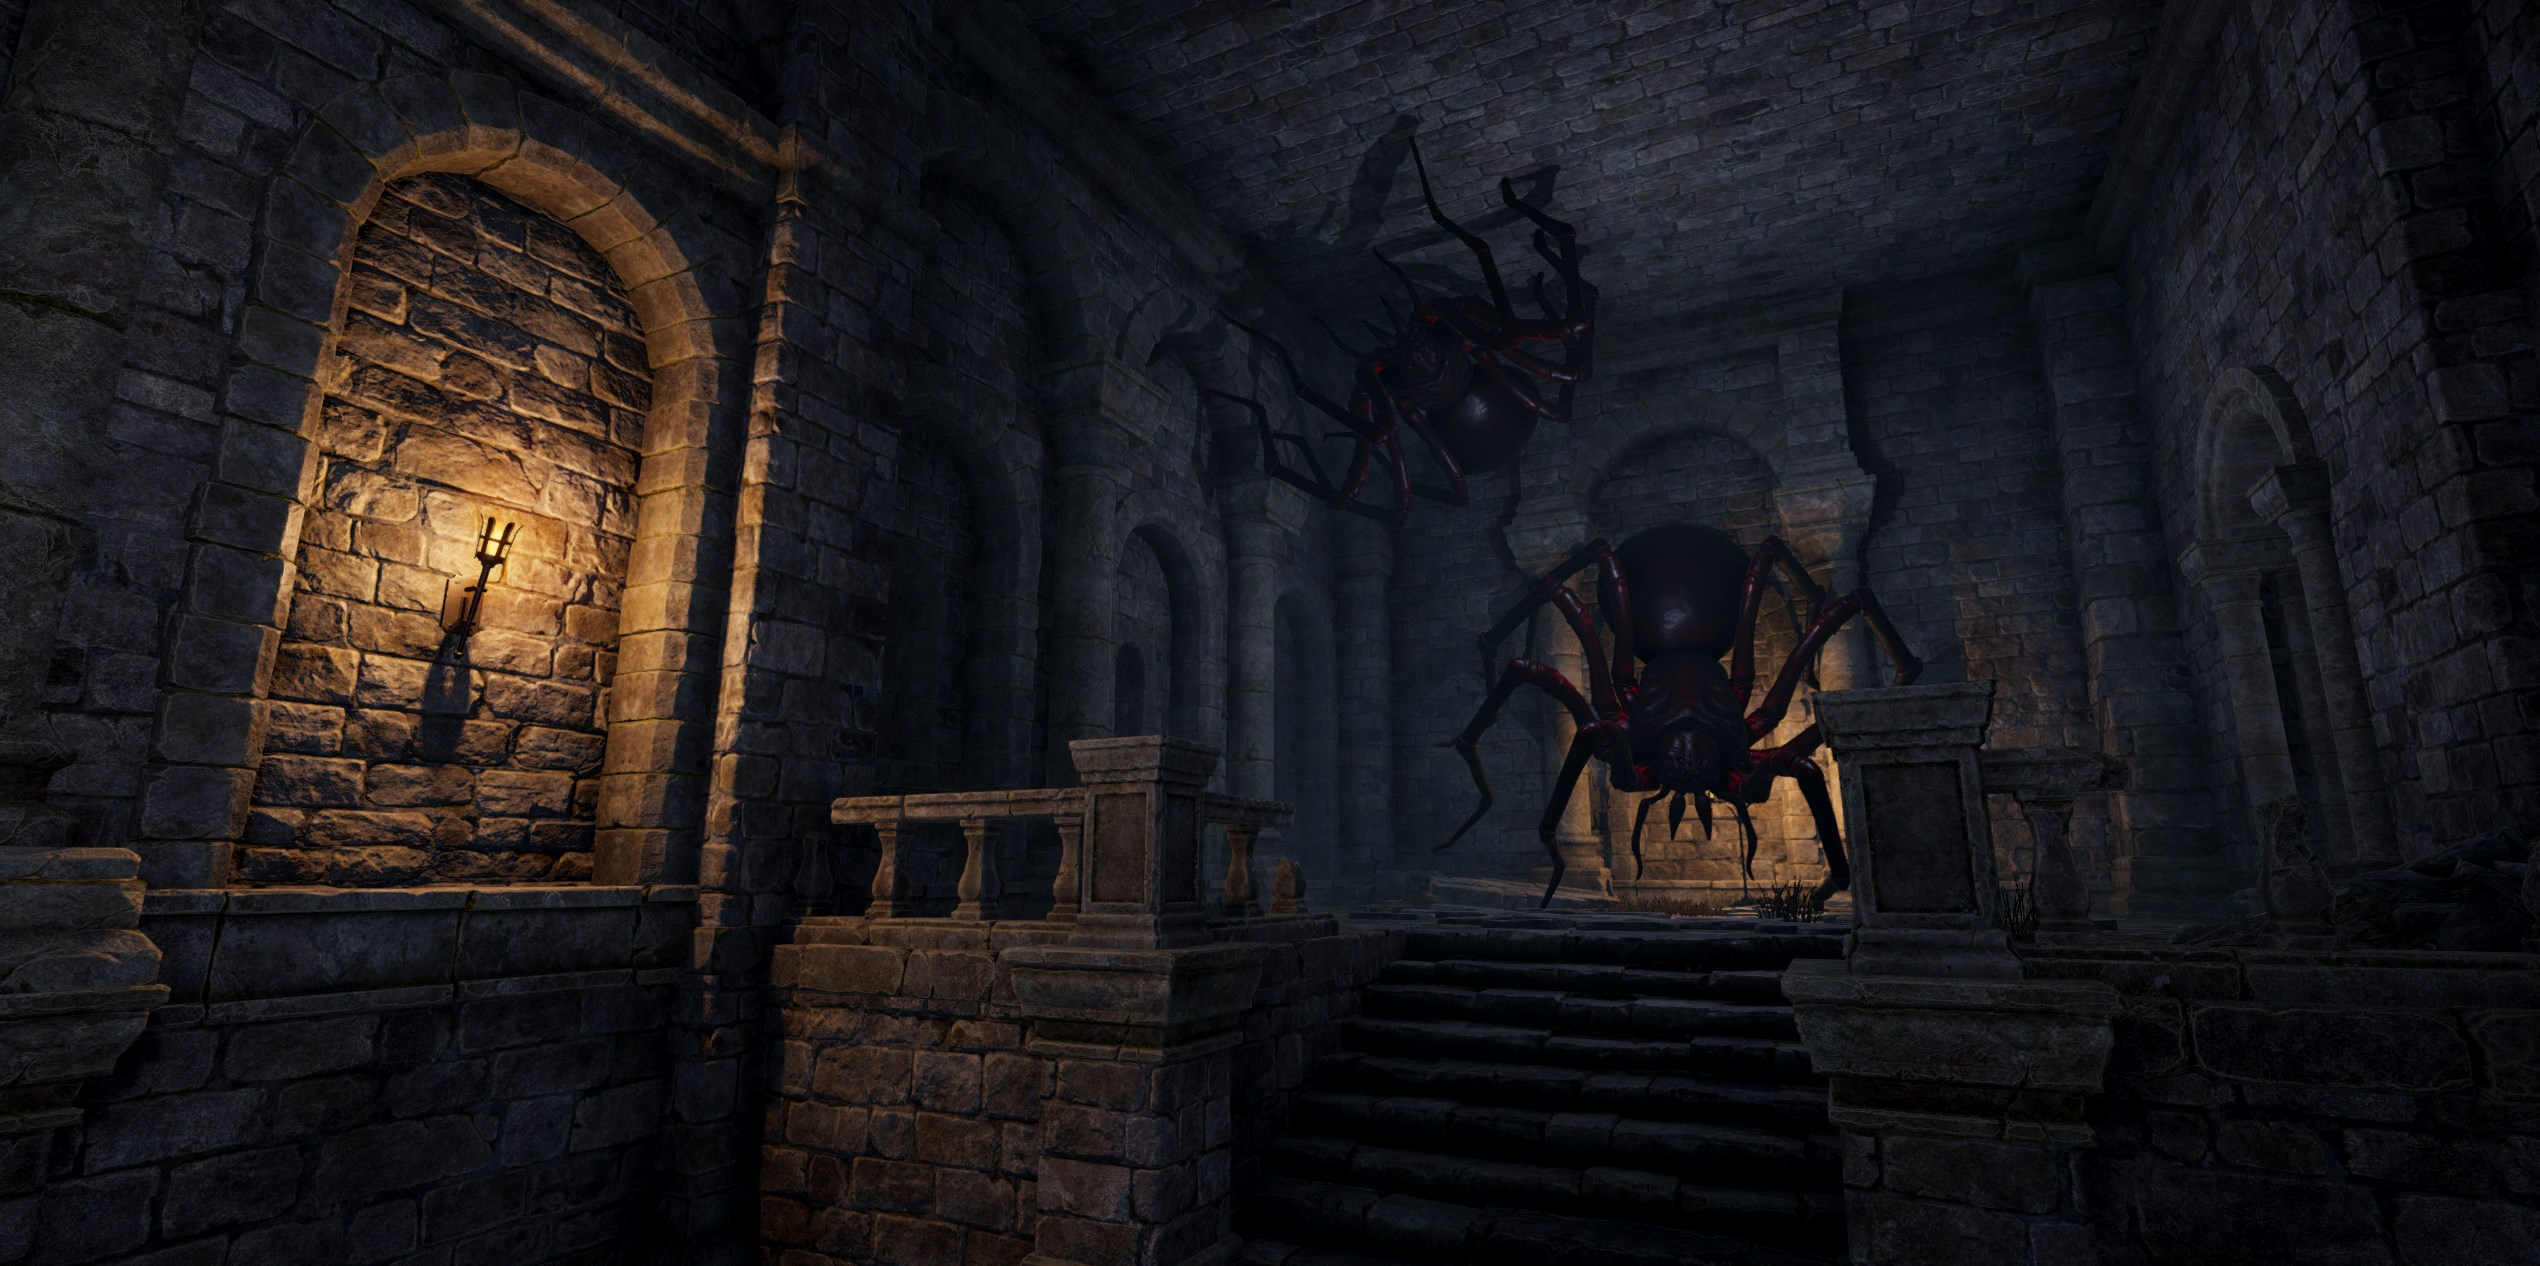 creepy spider 6.jpg